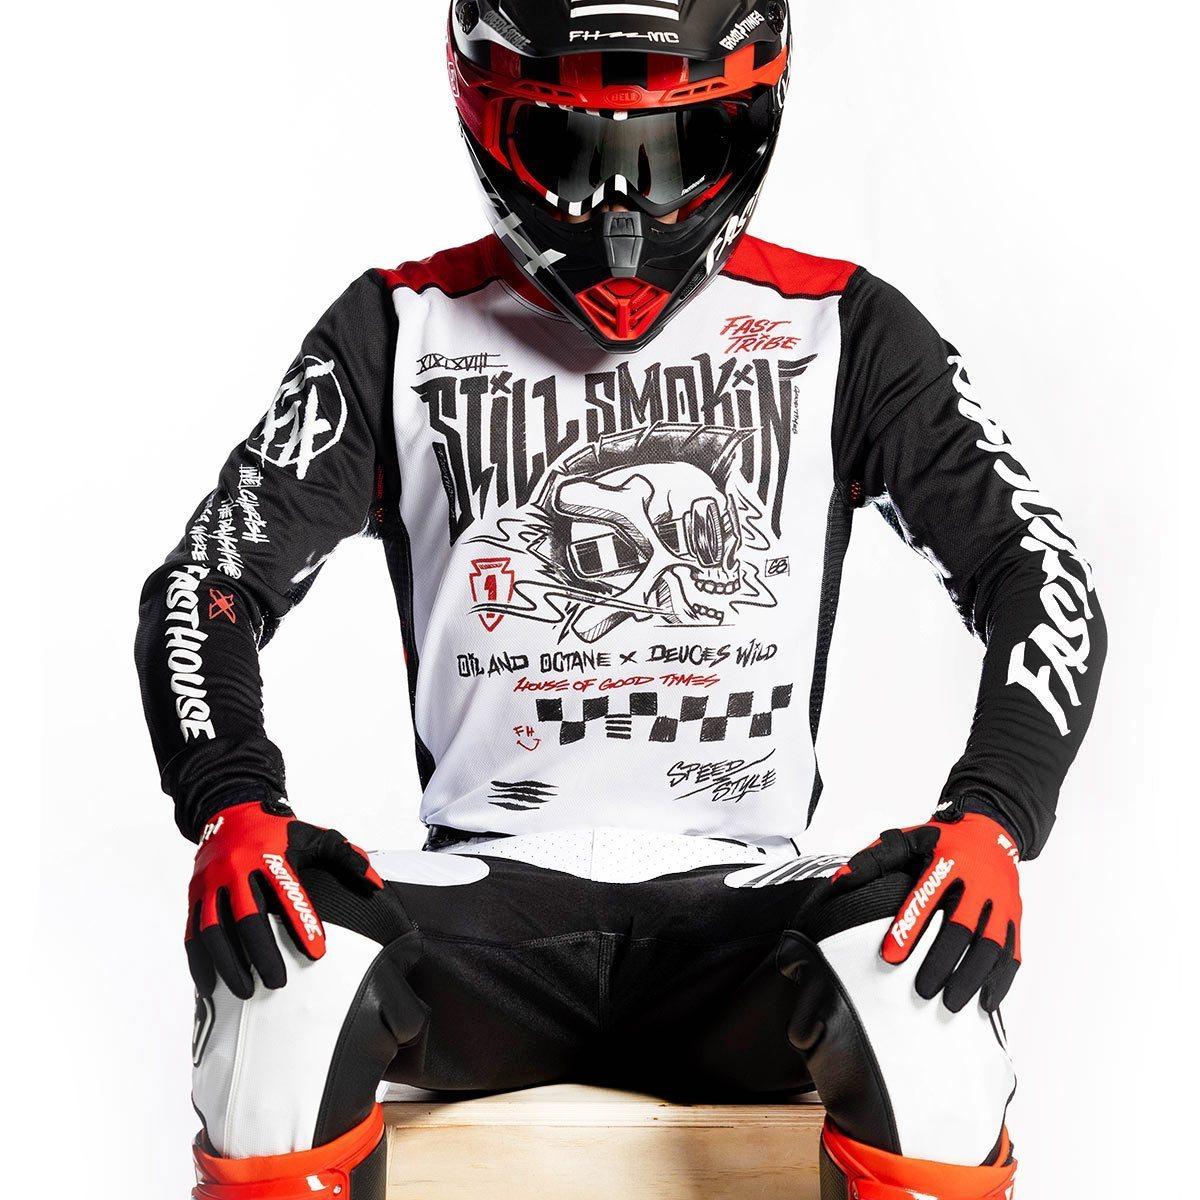 BMXProtect Raceshirt Still Smoking 21